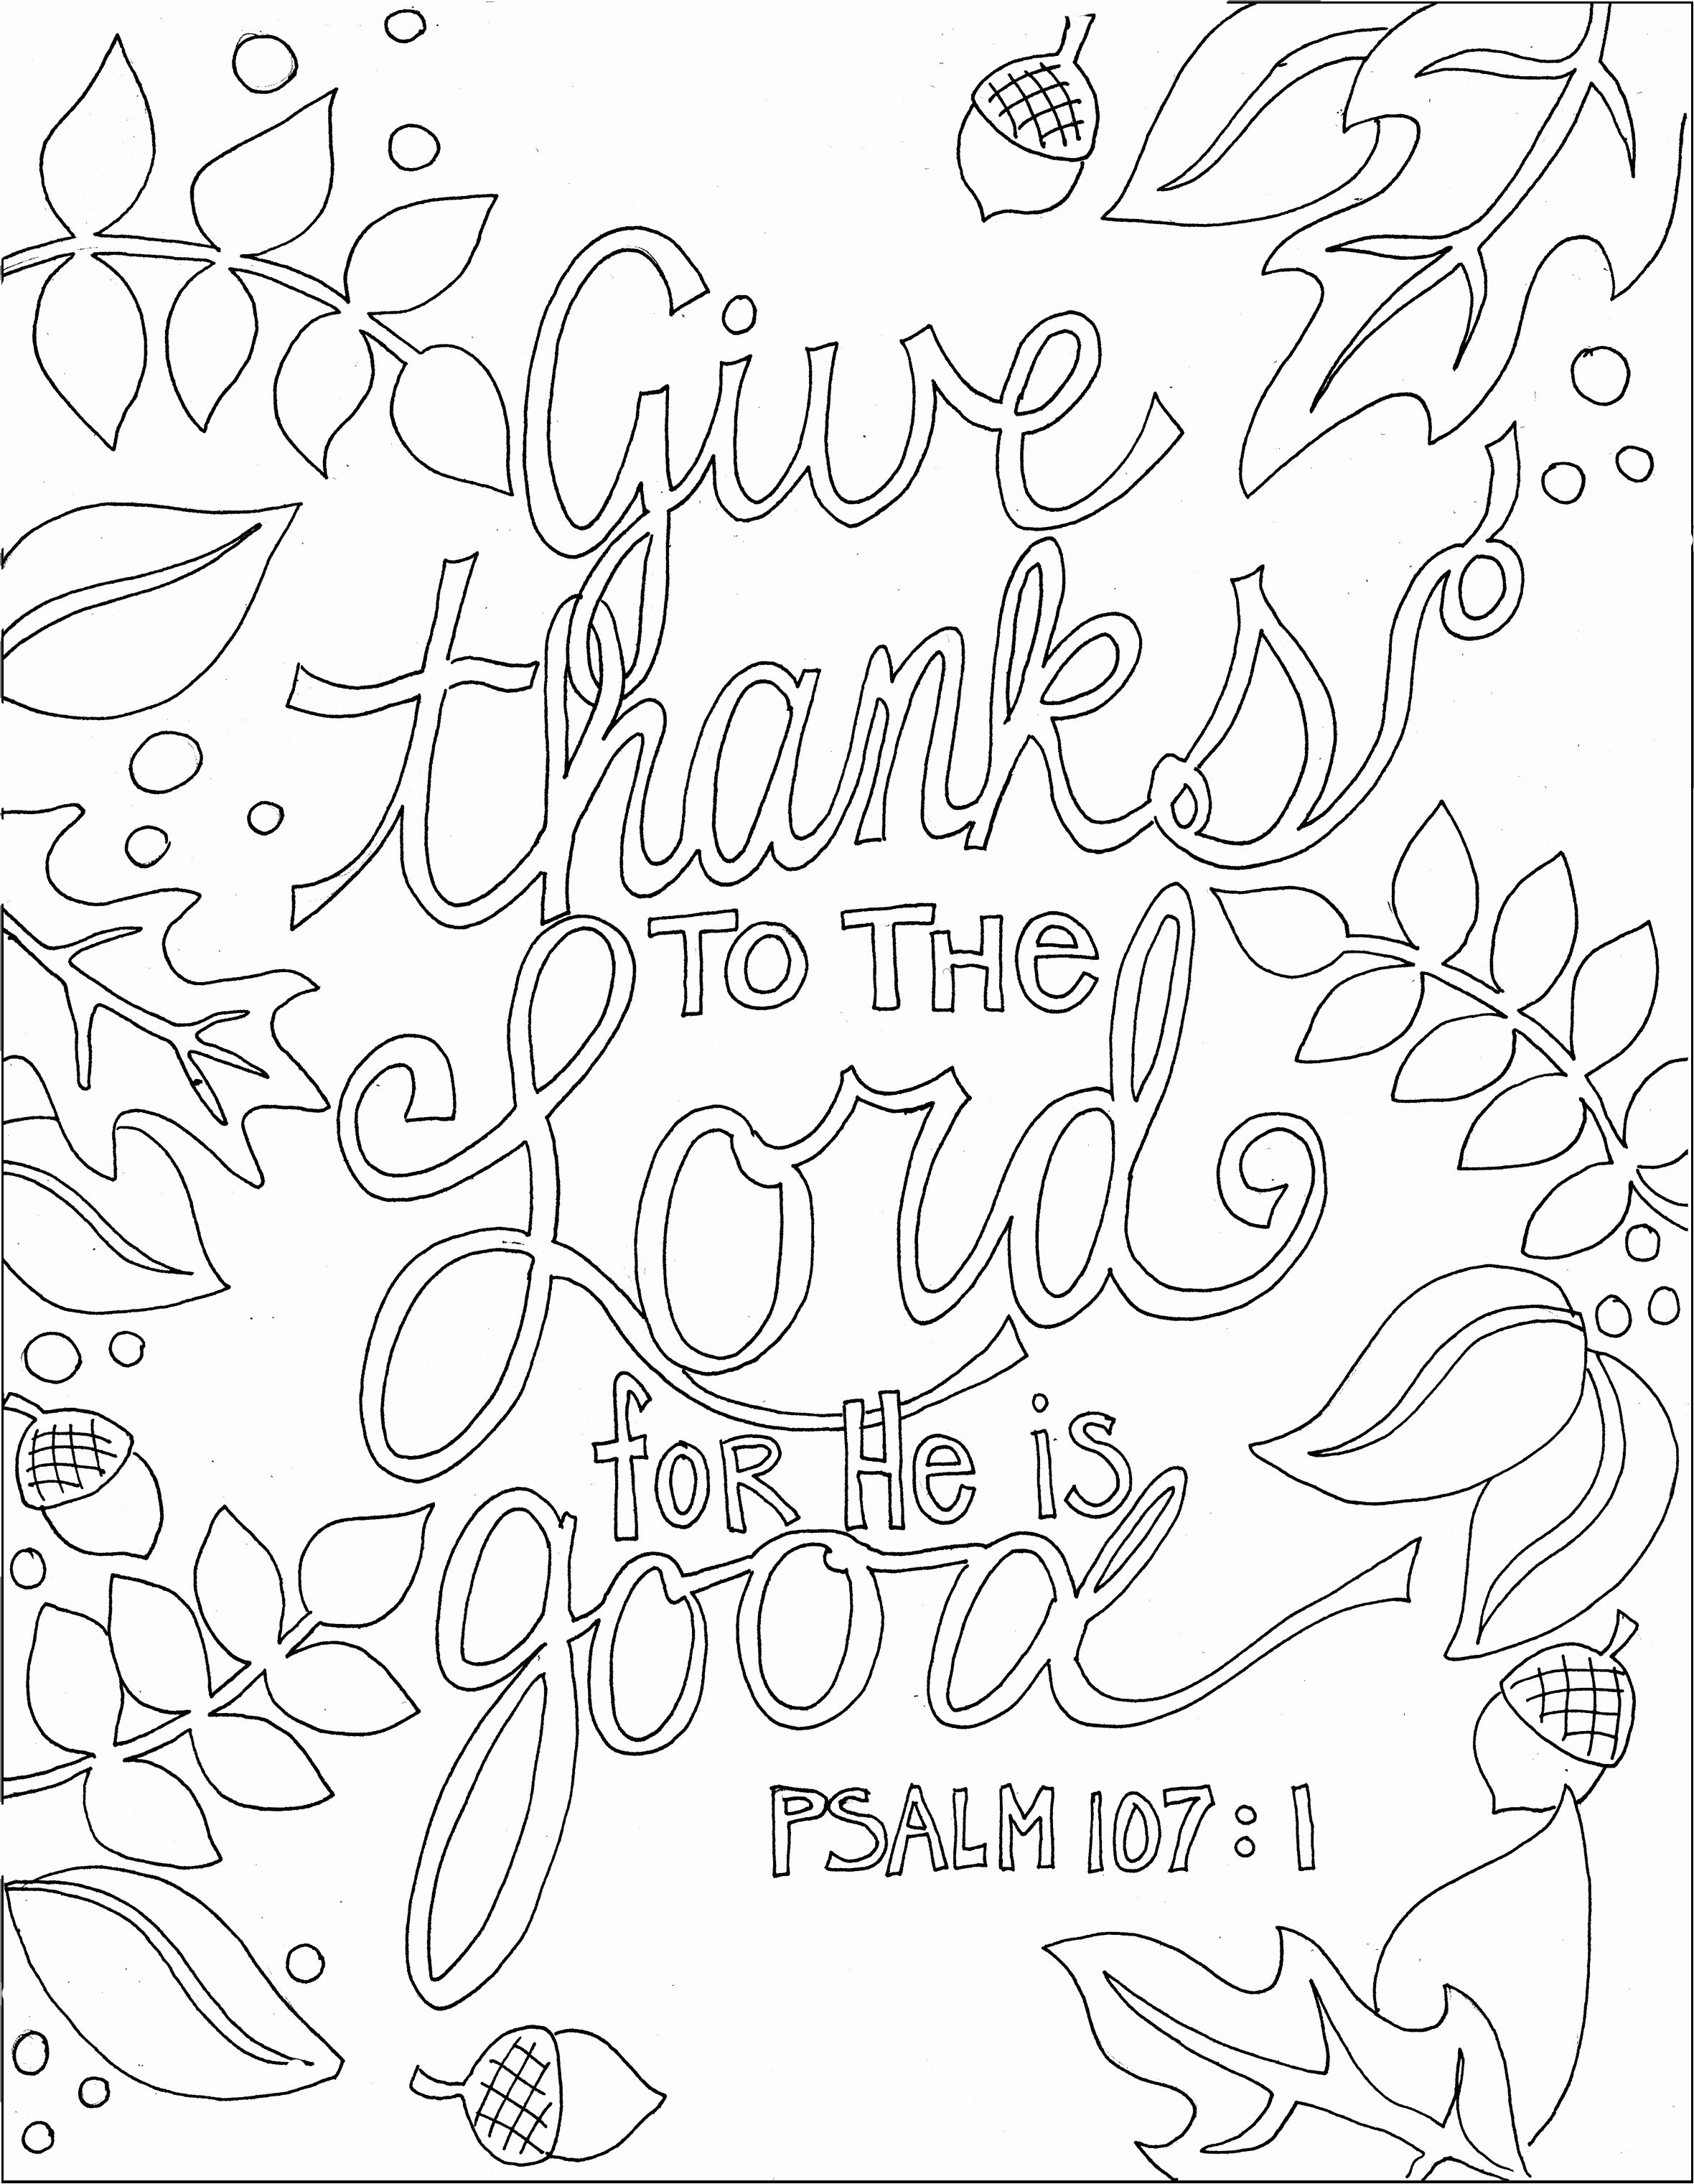 Coloring Pages Bible Stories Free Unique Bible Verse Coloring Pages - Free Printable Bible Story Coloring Pages